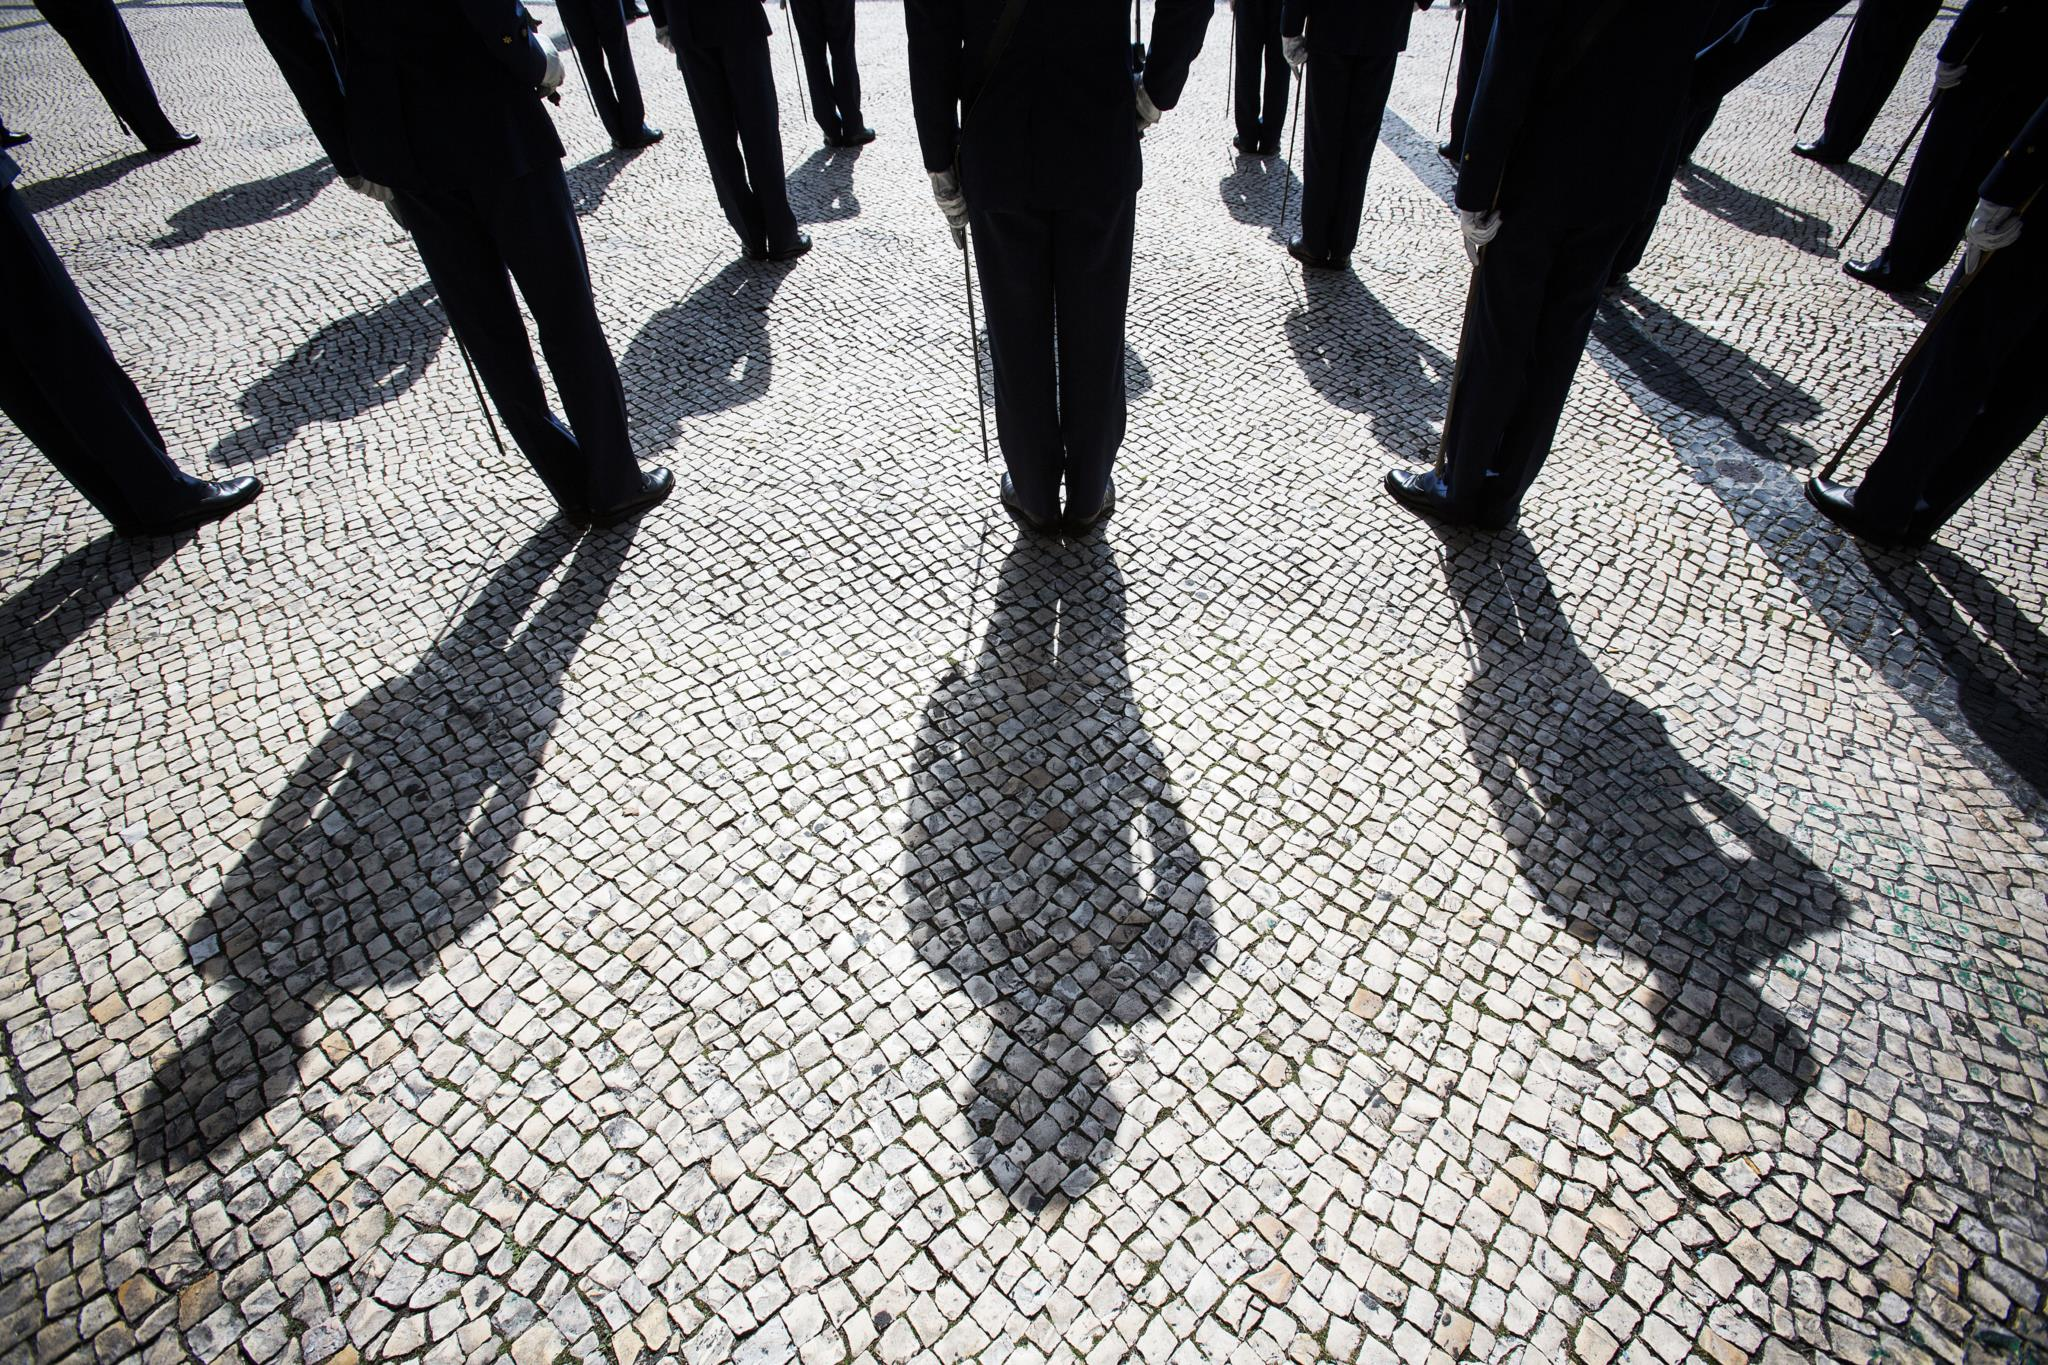 PÚBLICO - José Pedro Teixeira Fernandes